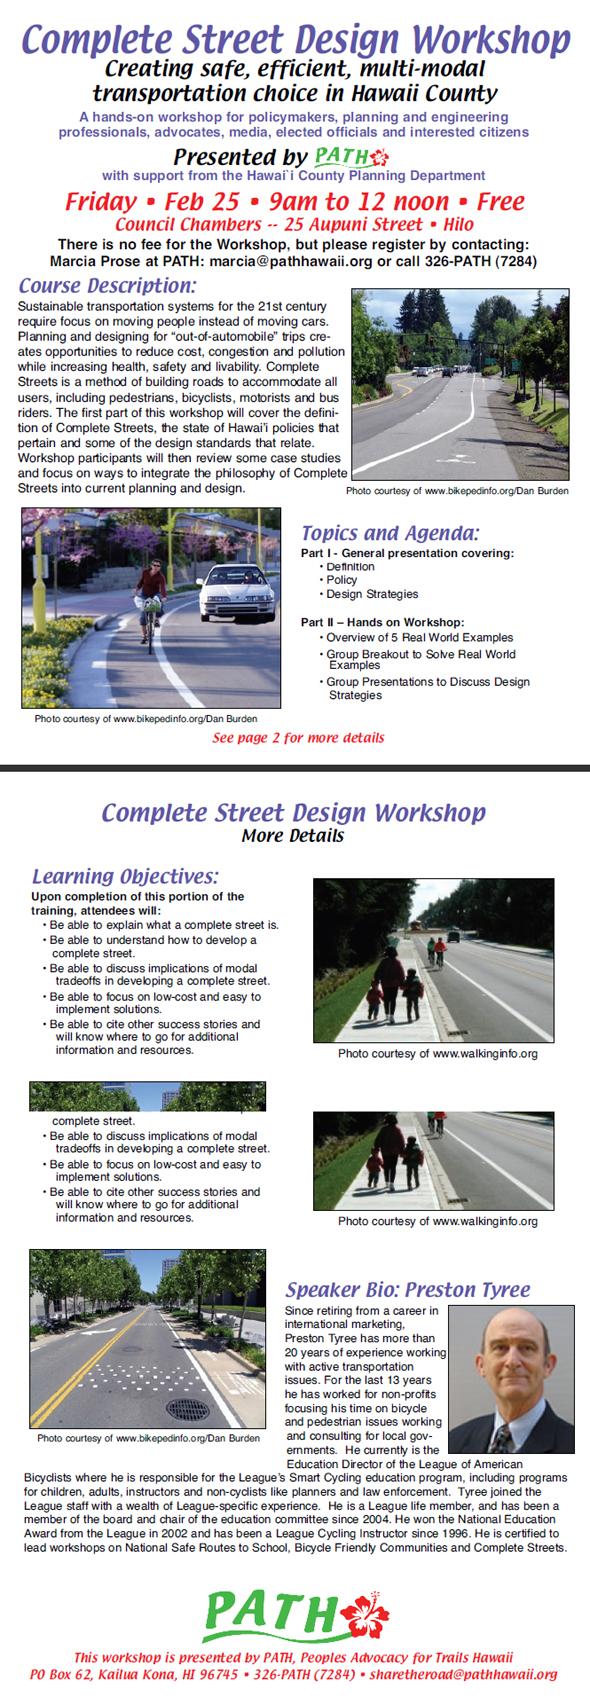 Complete Street Design Workshop in Hilo, Feb. 25